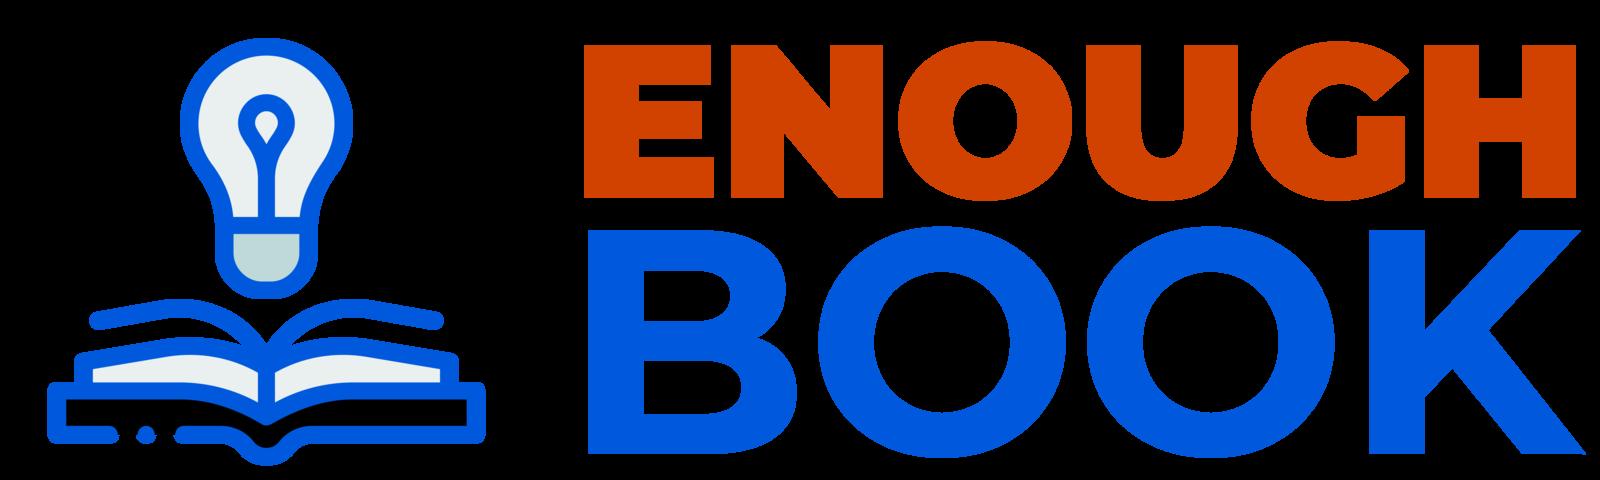 enoughbook logo